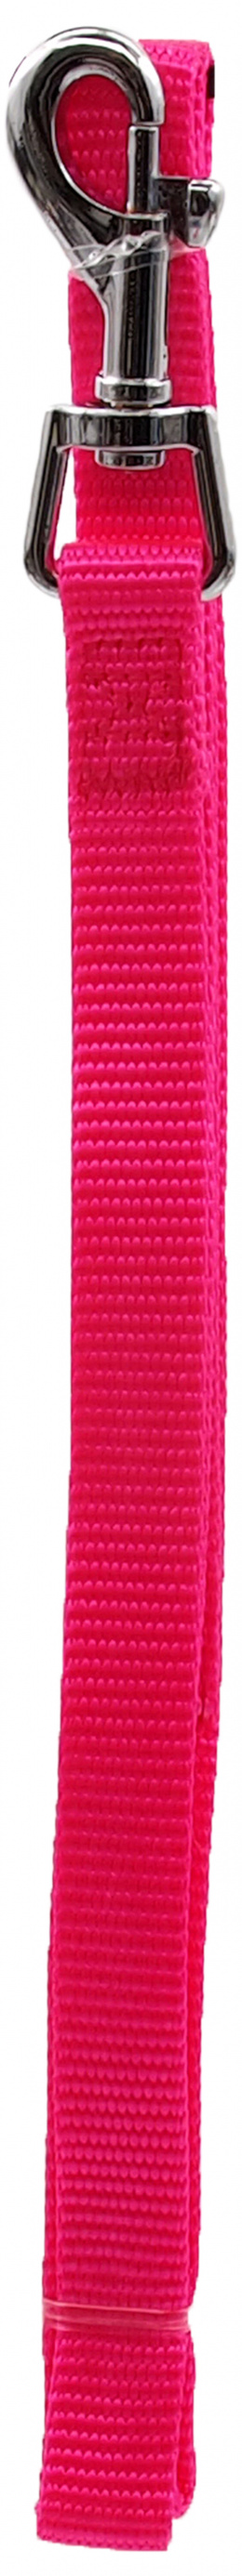 Pavada – Dog Fantasy Classic Neilona S, 15 mm, 120 cm, krāsa – rozā